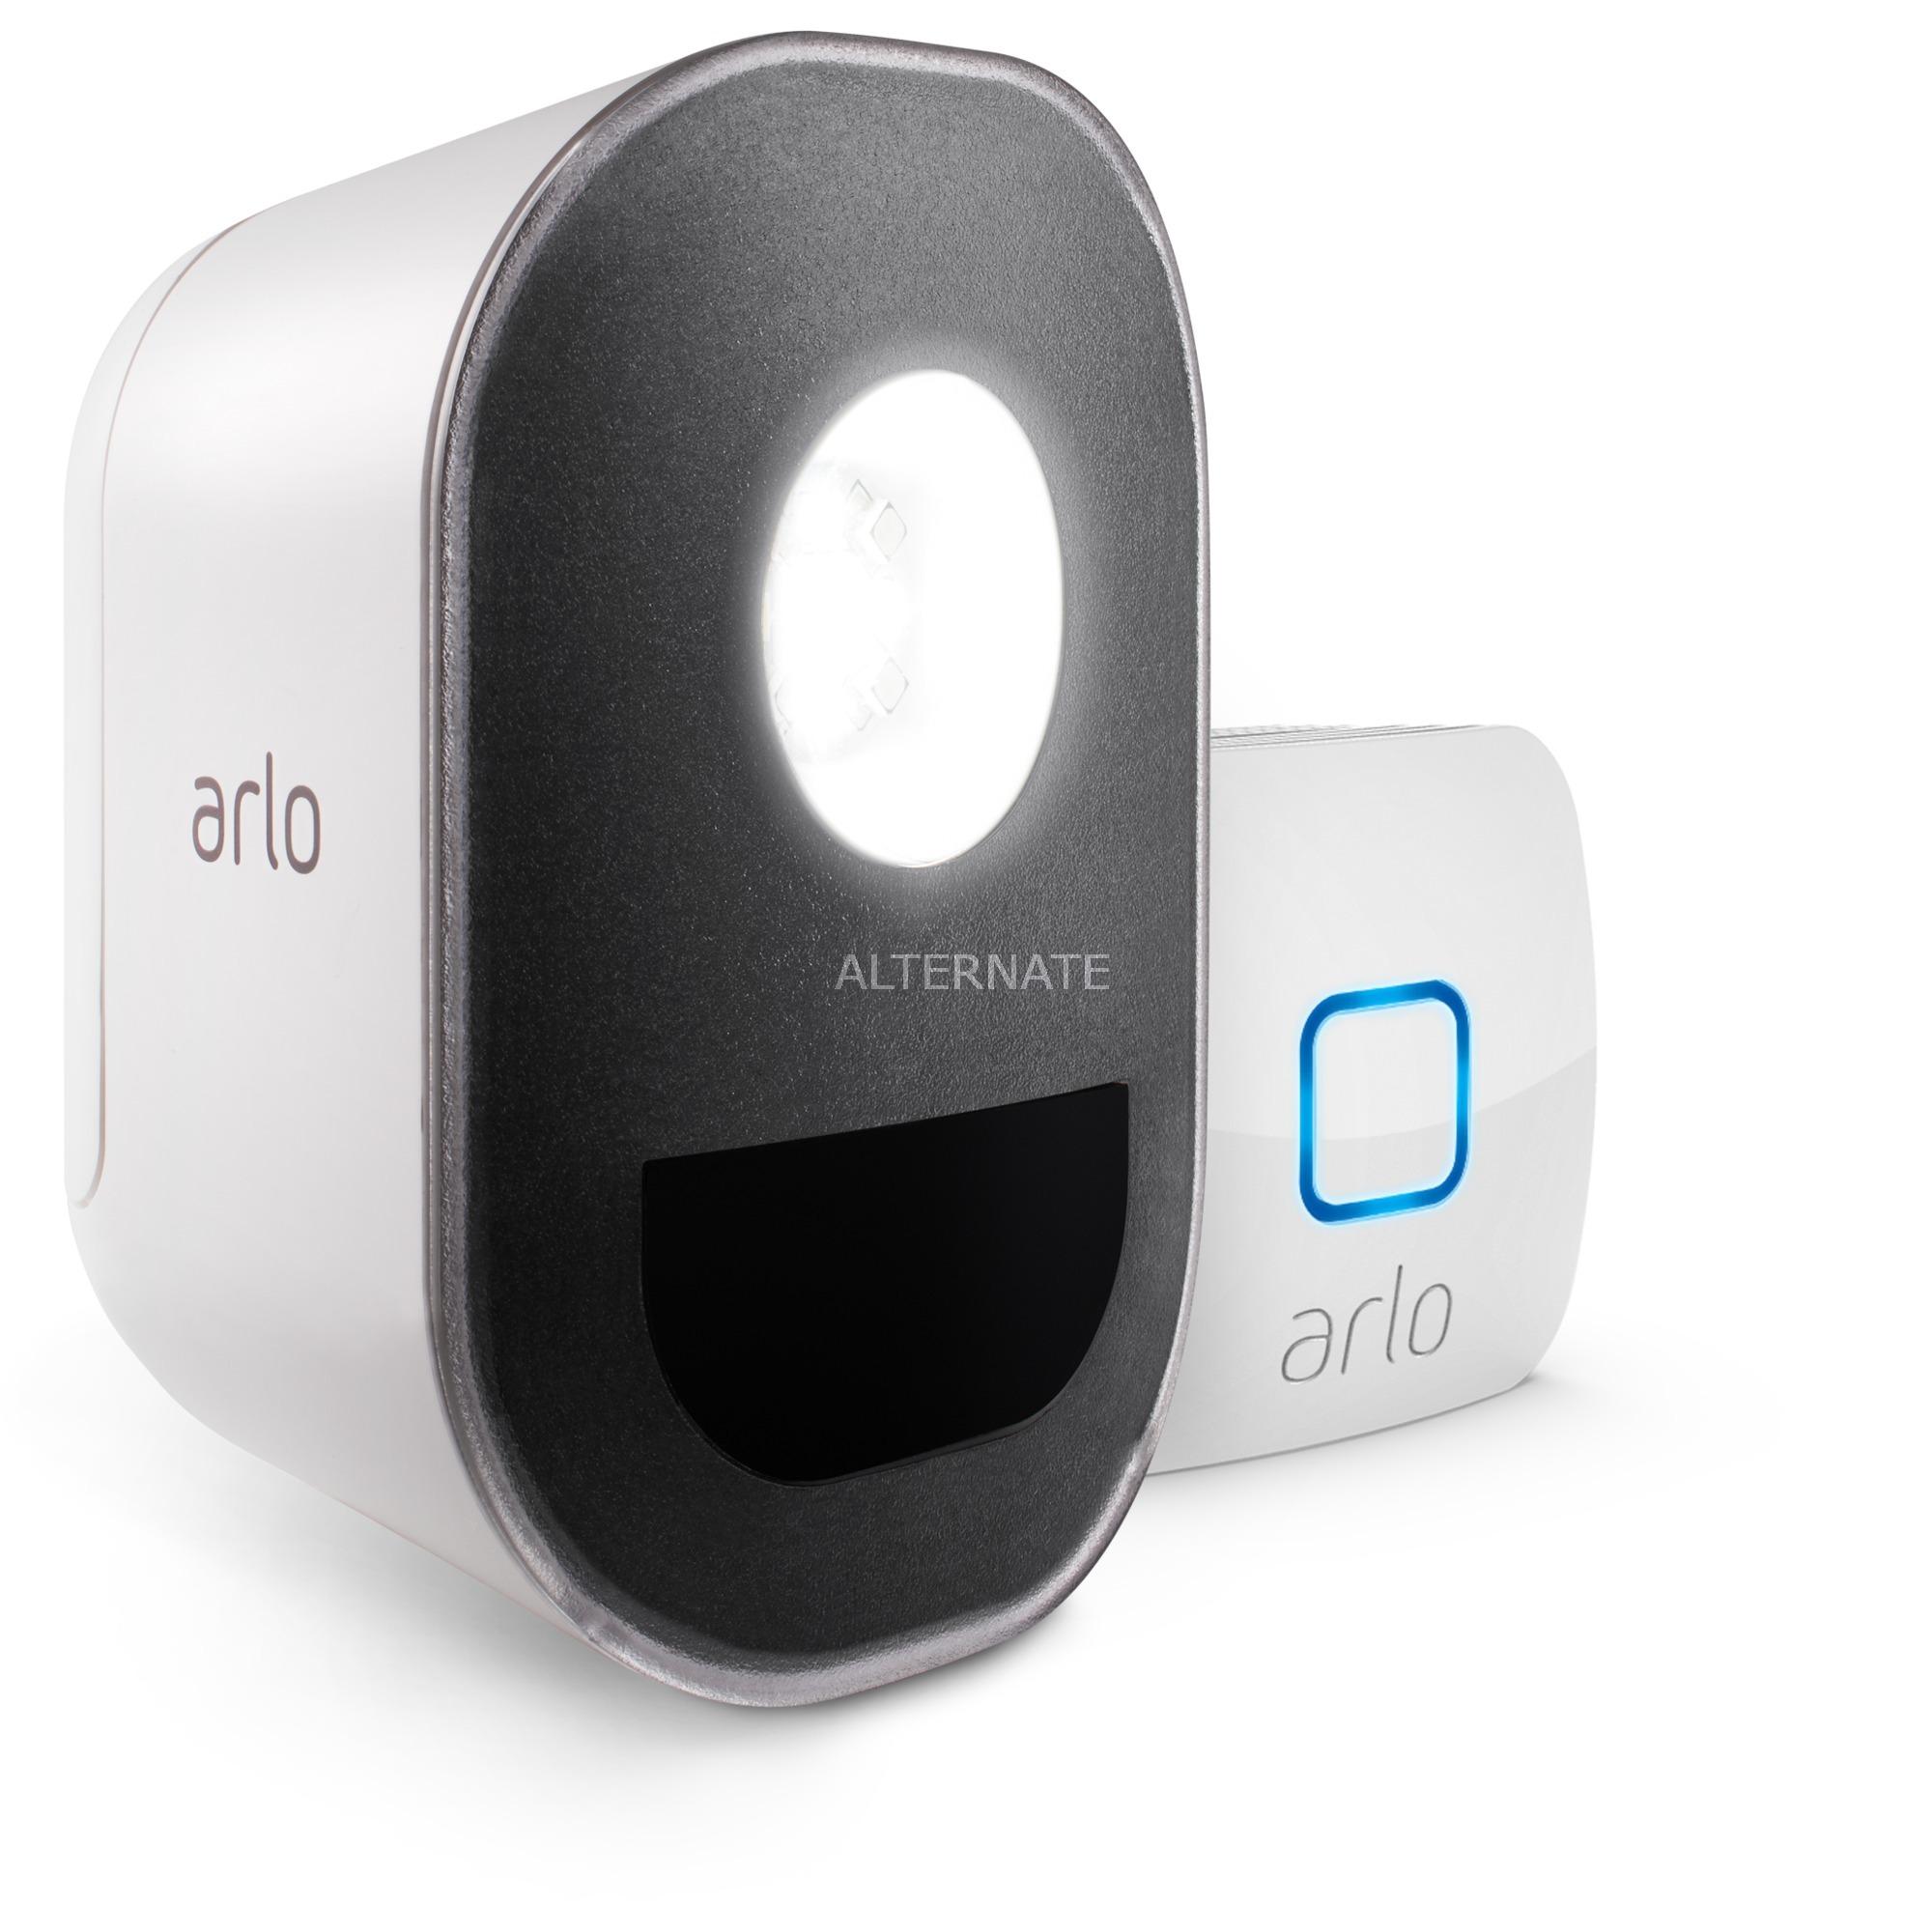 ALS1101 Smart suspension light Wi-Fi Negro, Blanco, Luz de LED